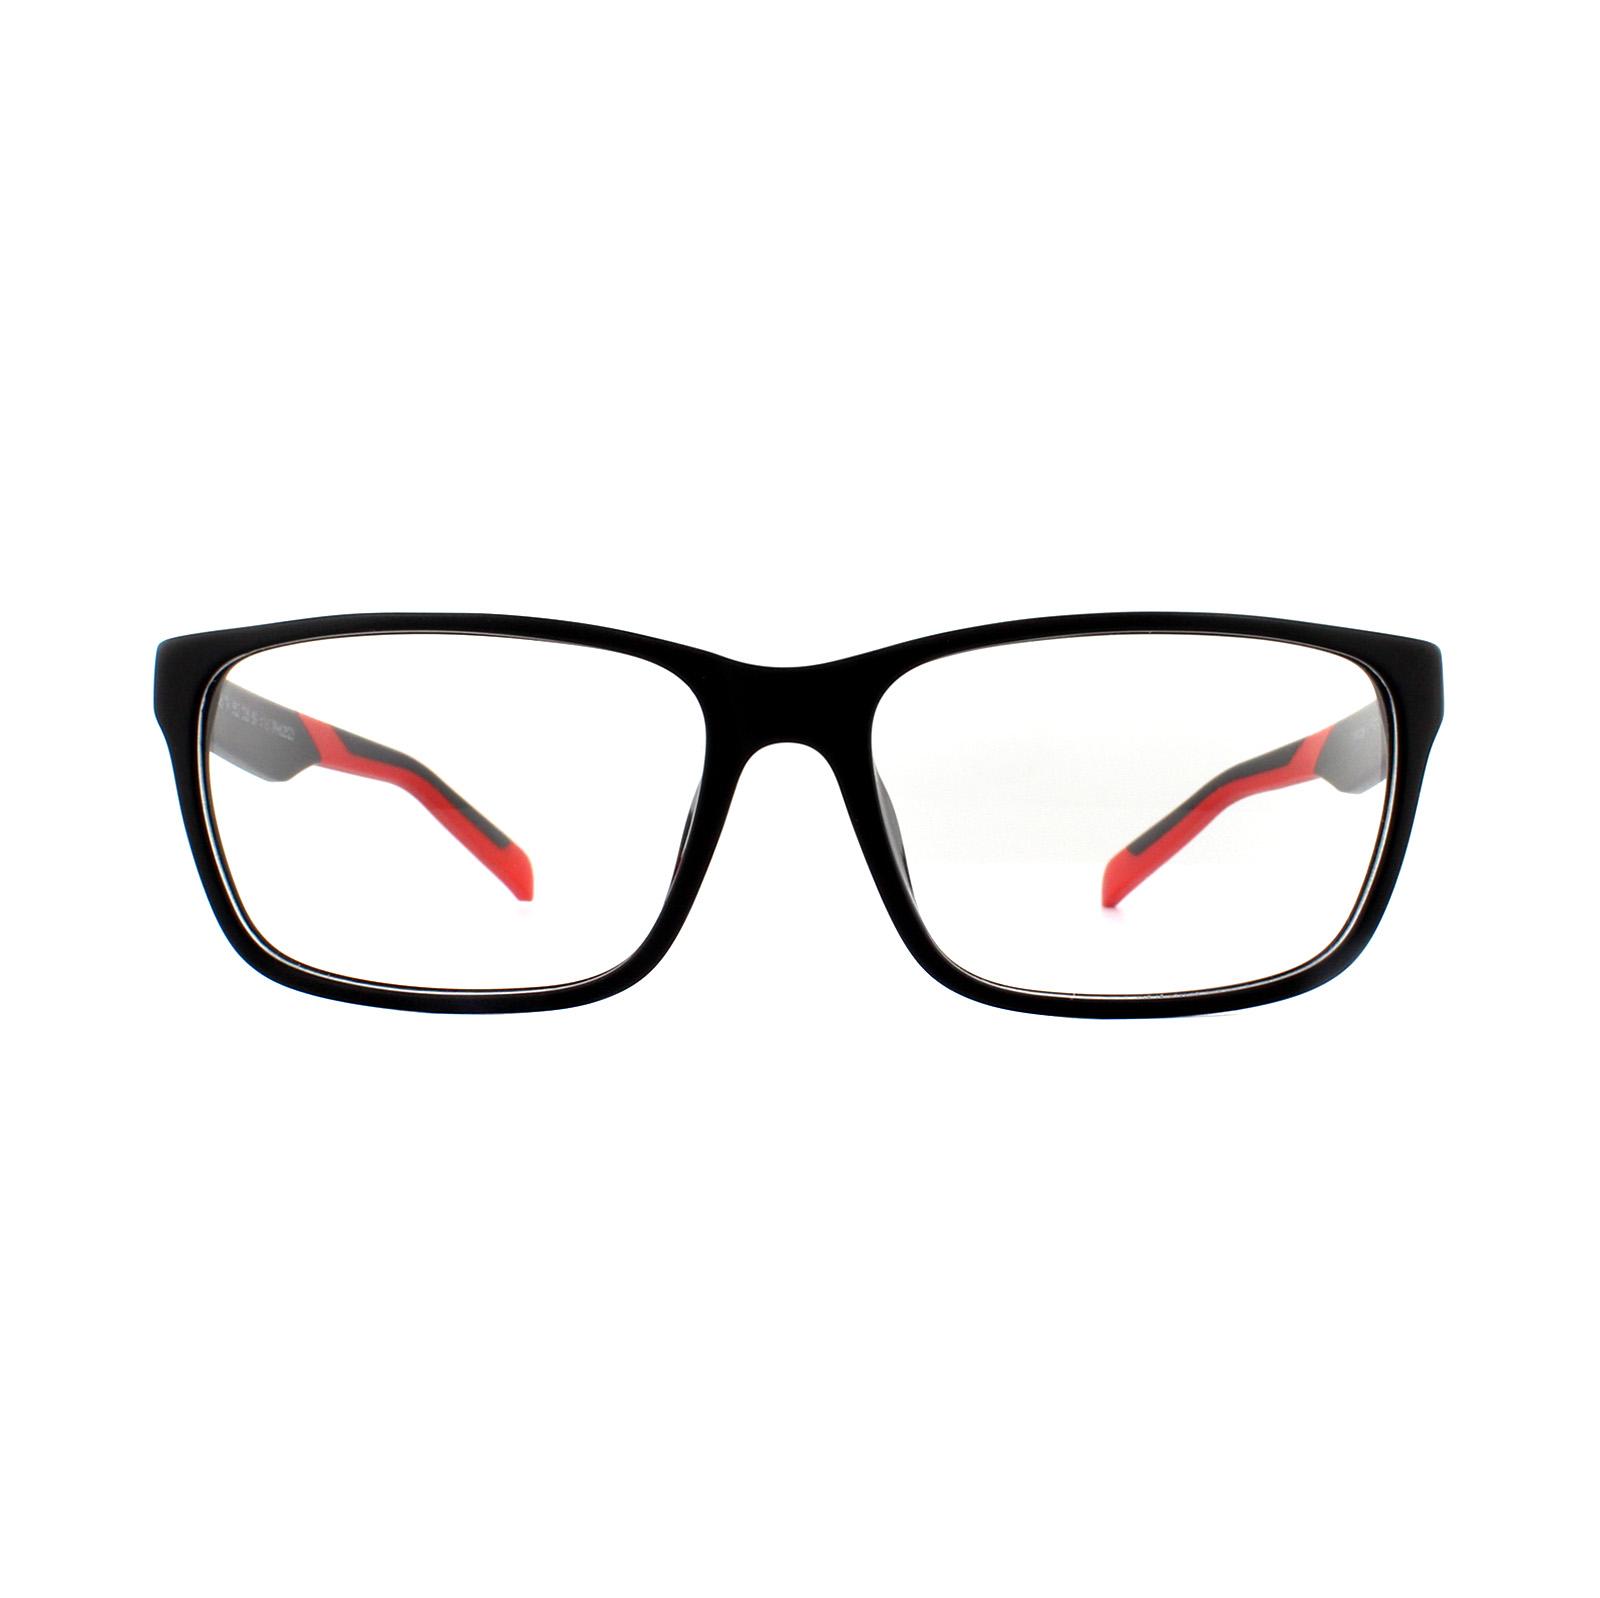 cb3f8f479c Sentinel Thumbnail 1. Sentinel Tag Heuer Glasses Frames B-Urban TH0552 005  Black   Red. Sentinel Thumbnail 2